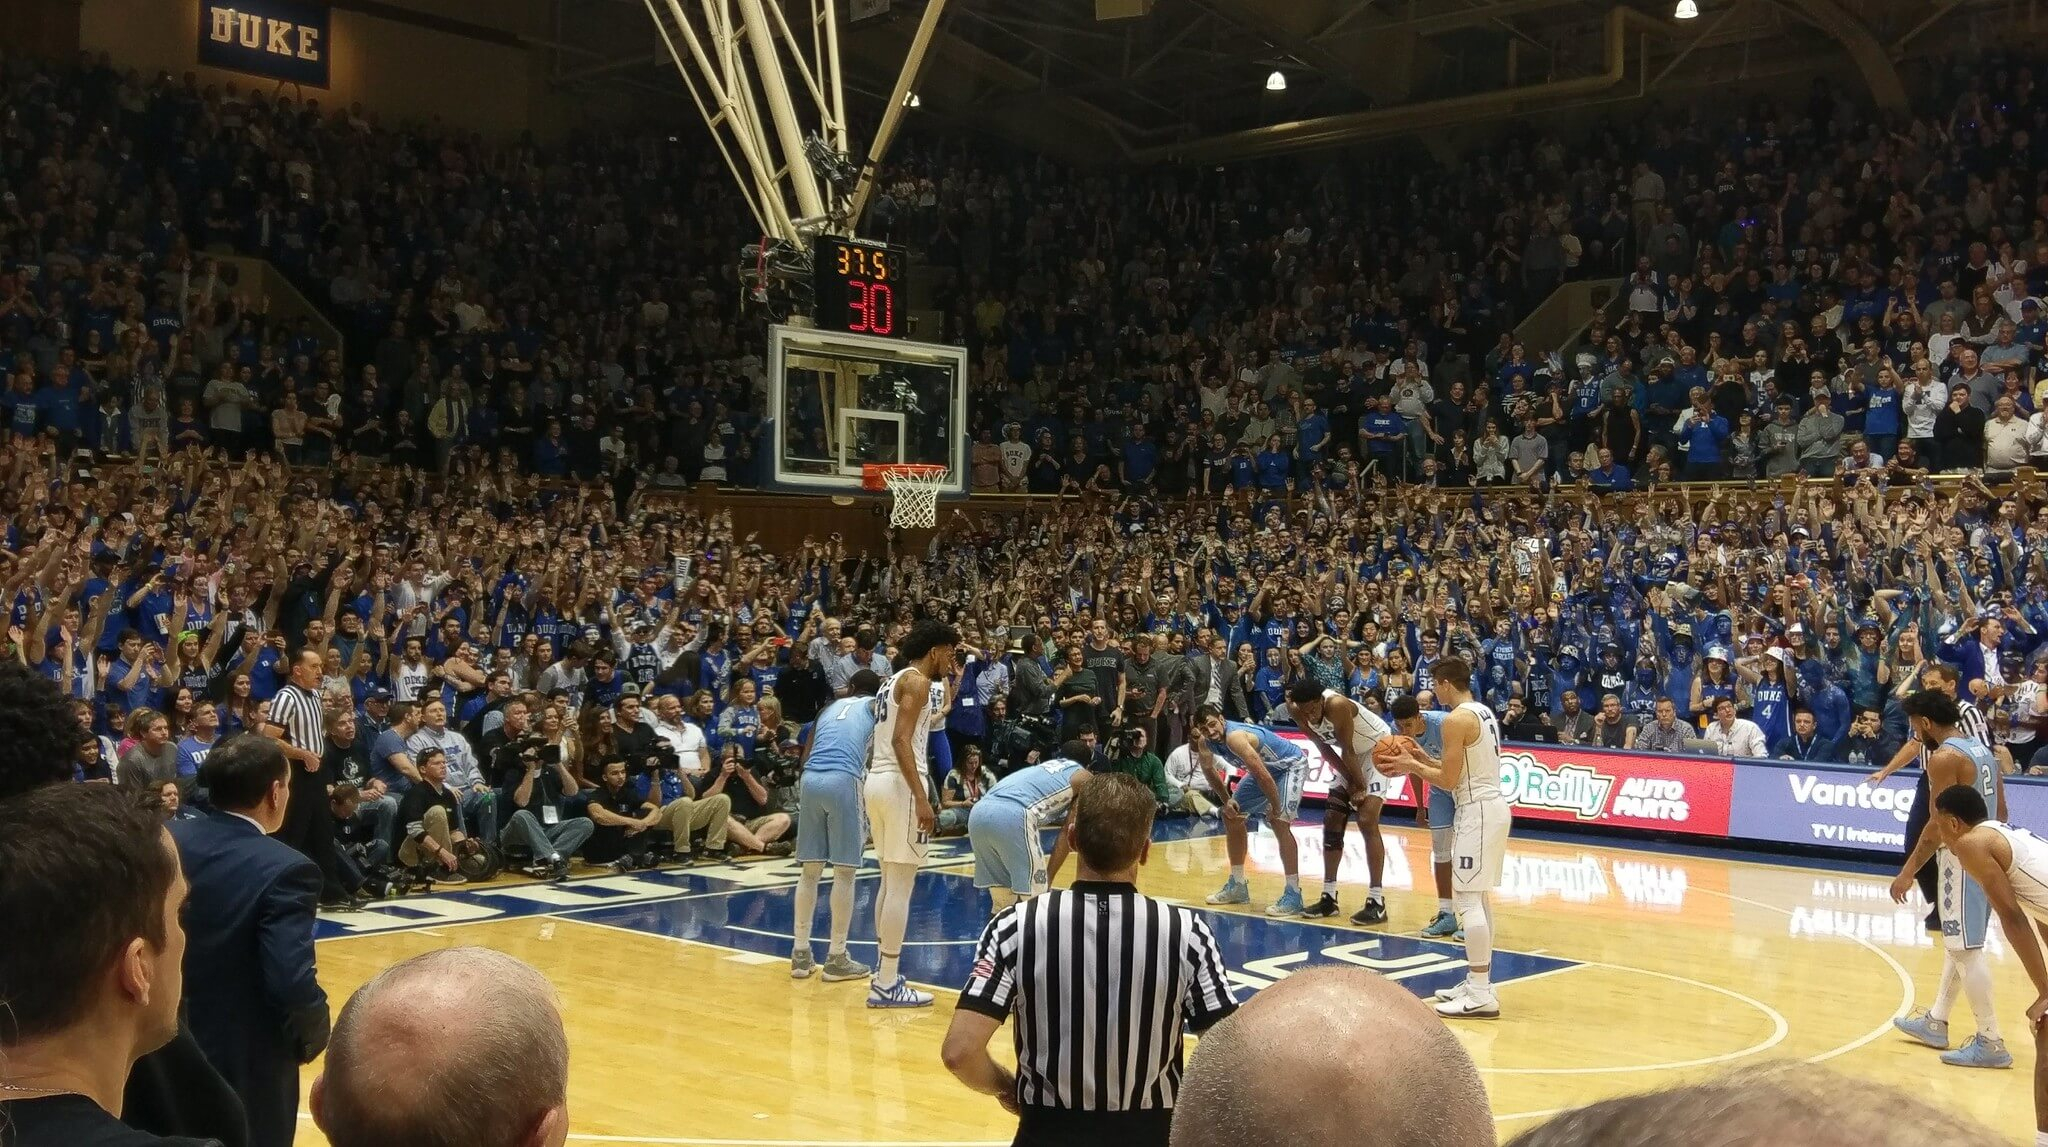 Duke vs North Carolina NCAAB basketball rivalry